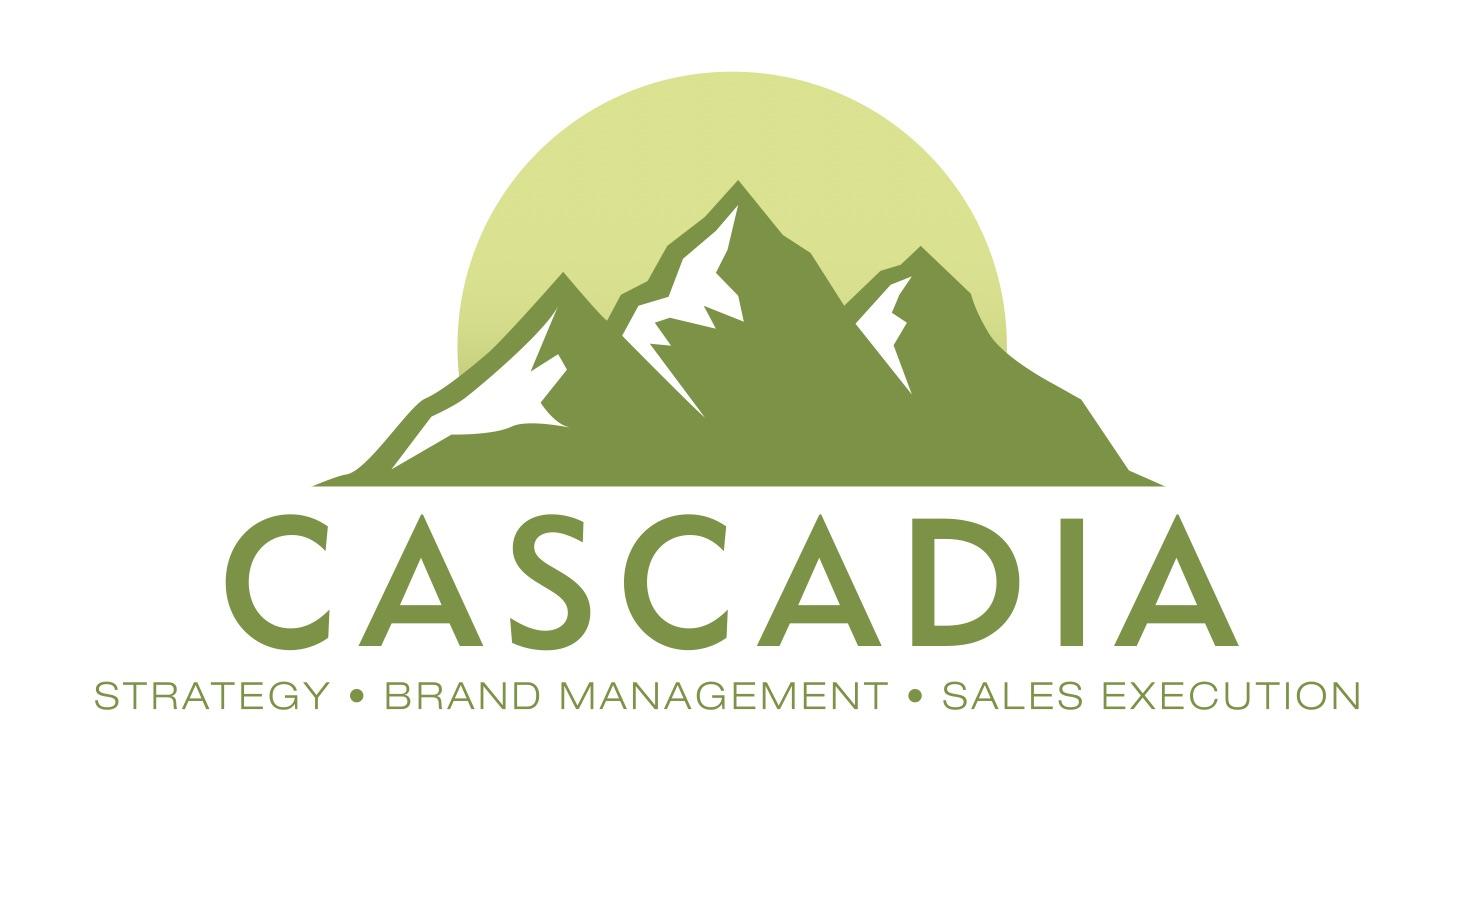 Cascadia Managing Brands - sponsoring BevNET Live Winter 2019